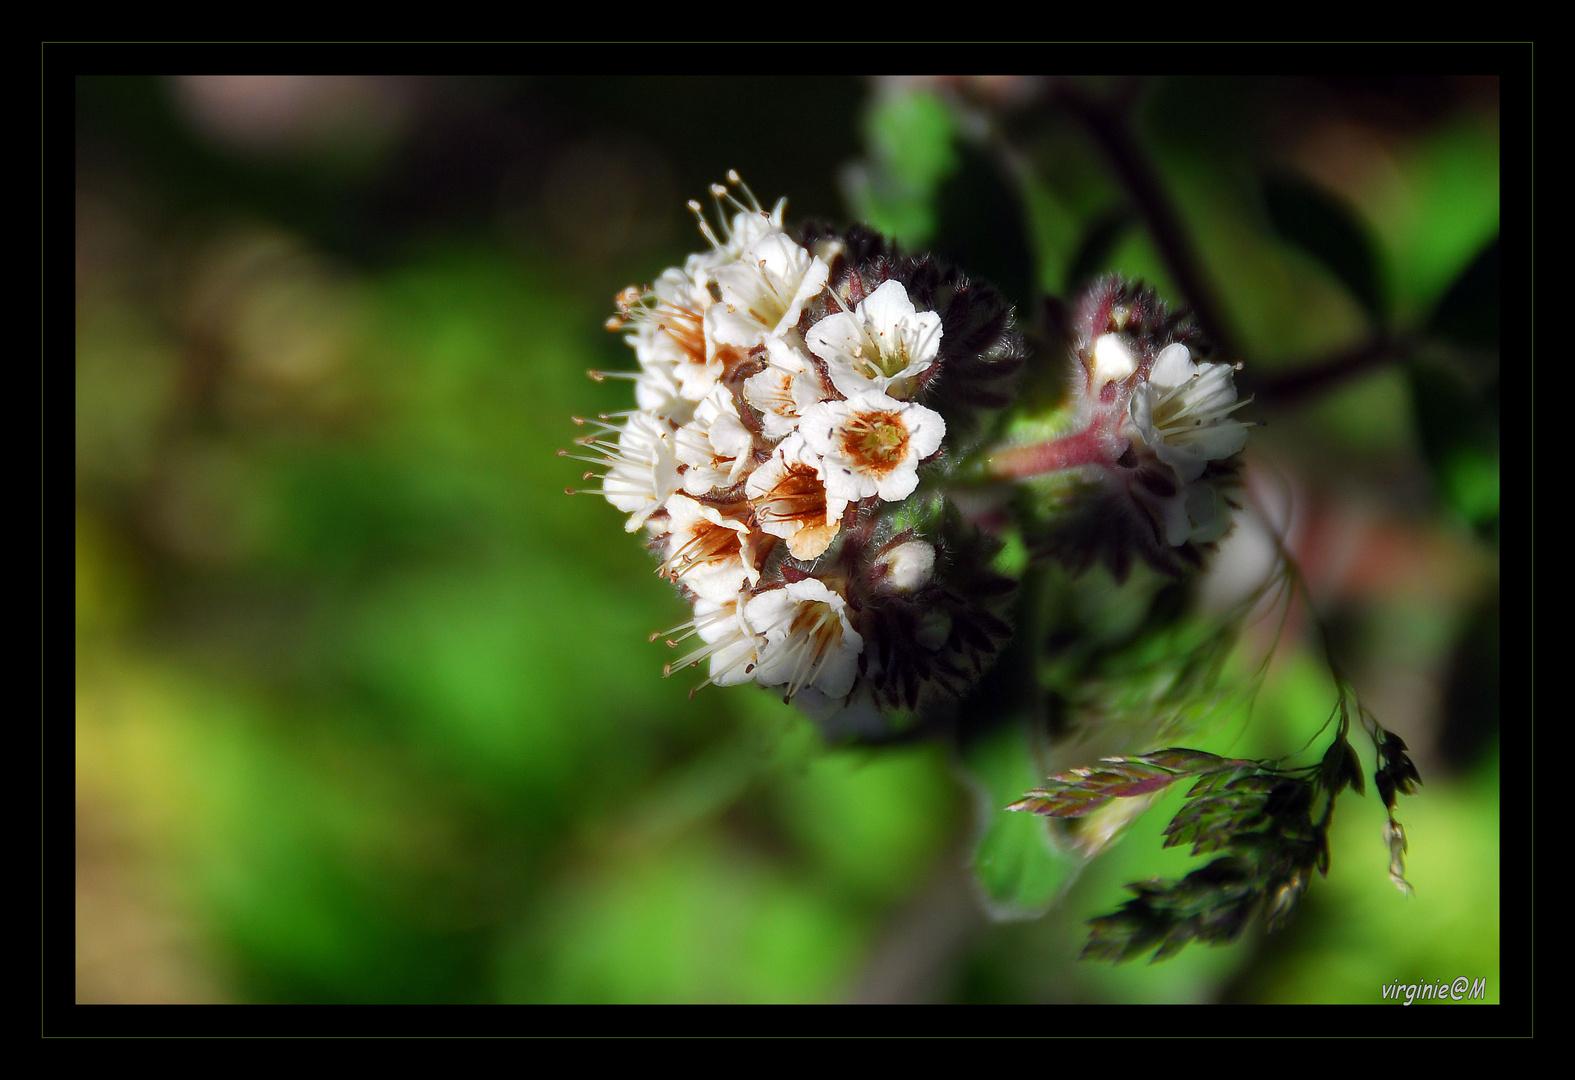 Flora blanca